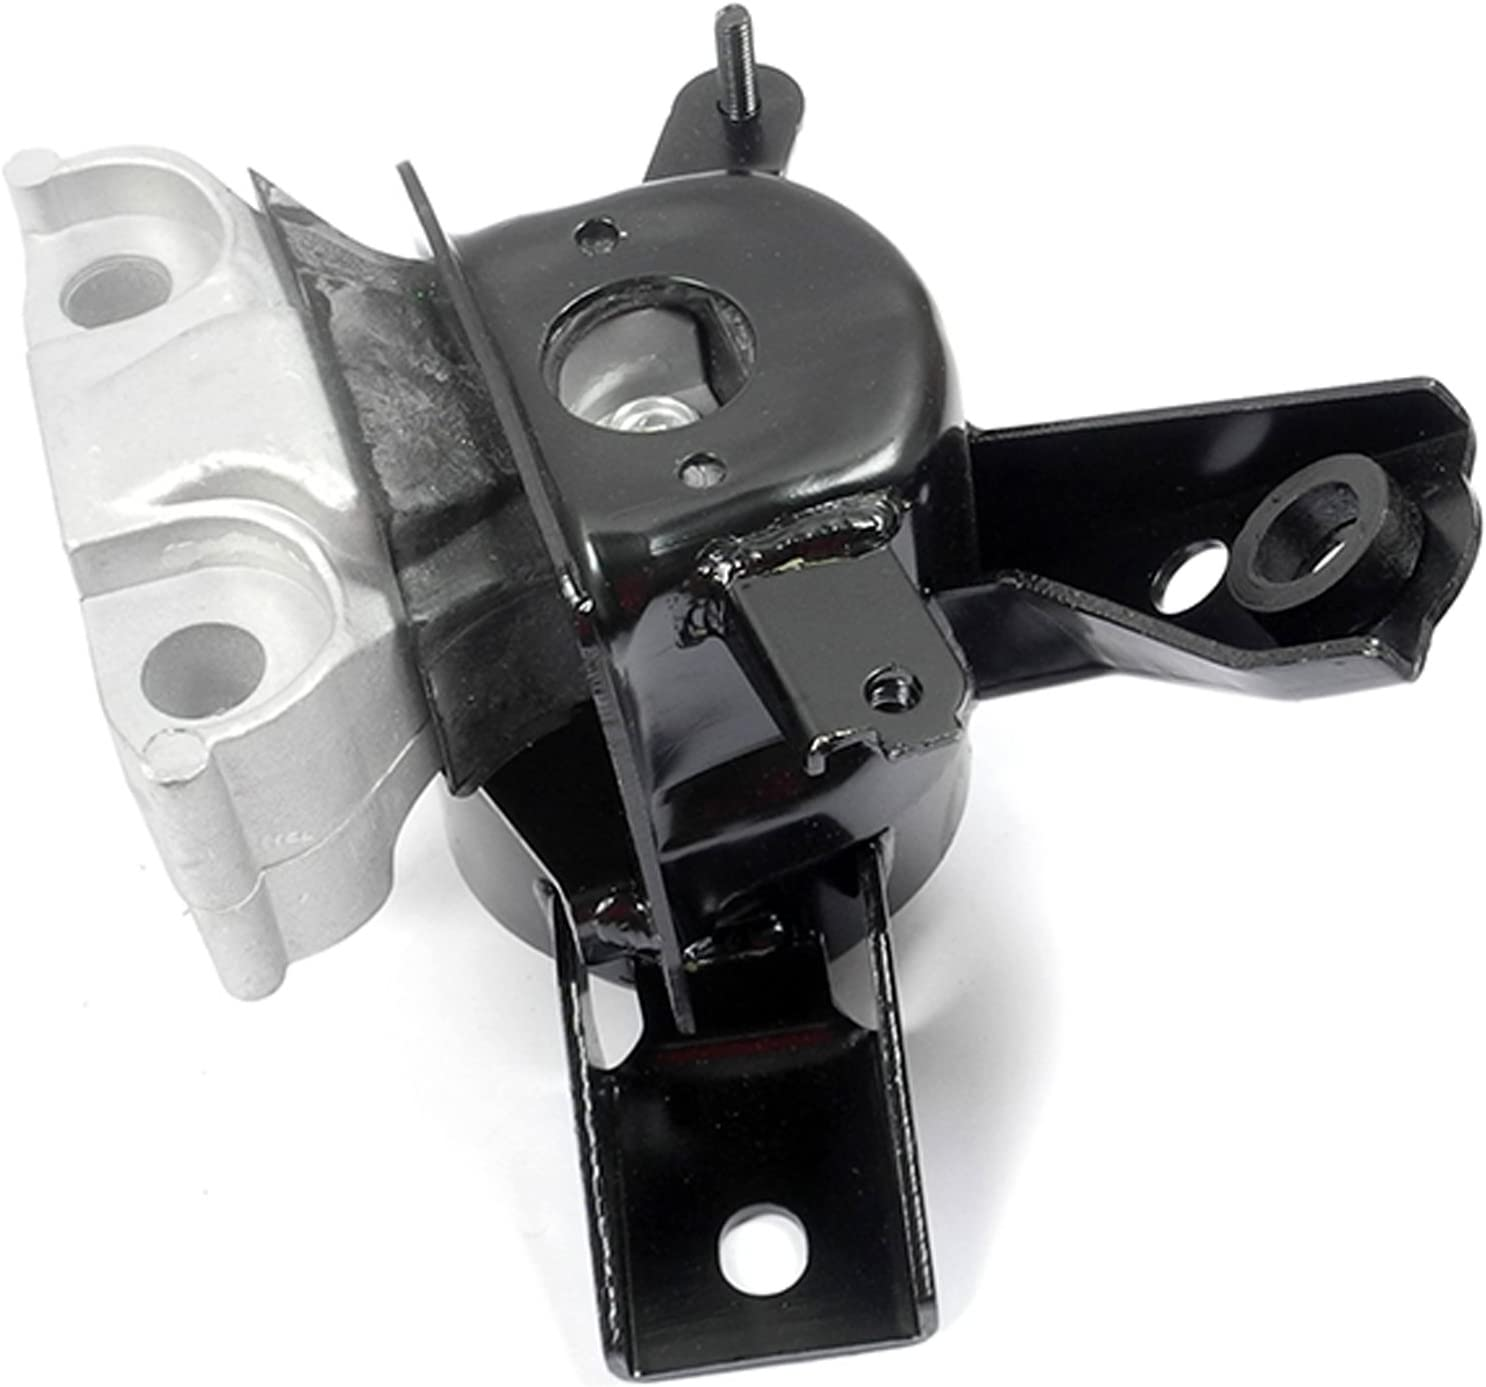 Front Right Engine Motor Mount For 2006-2012 Toyota RAV4 3.5 L4 9685 62072